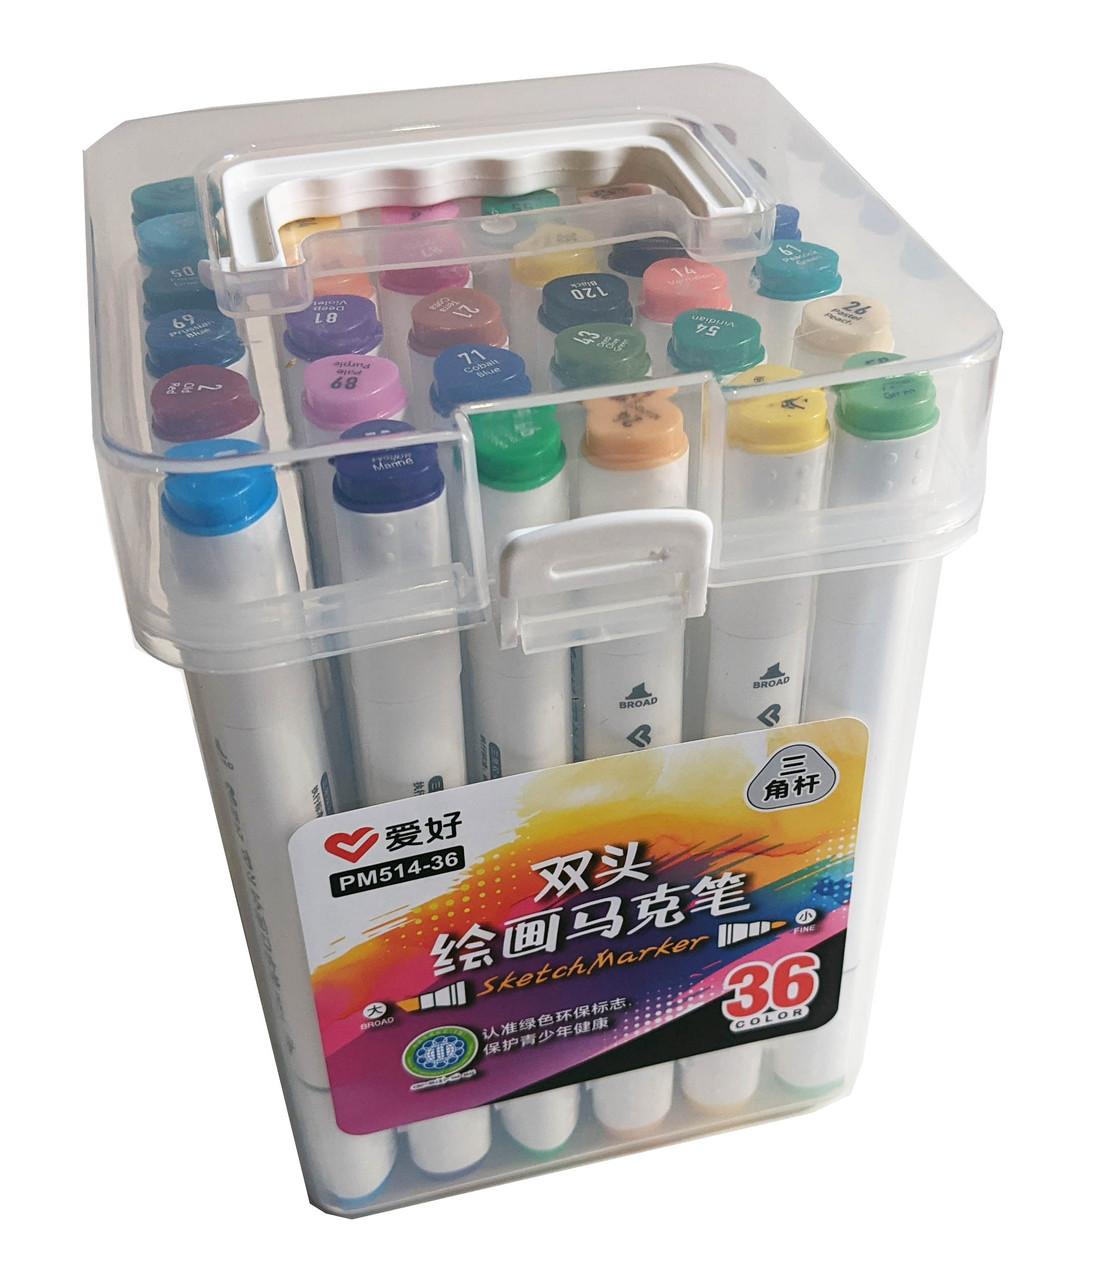 Набір скетч-маркерів 36 шт. для малювання двосторонніх Aihao sketchmarker код: PM514-36